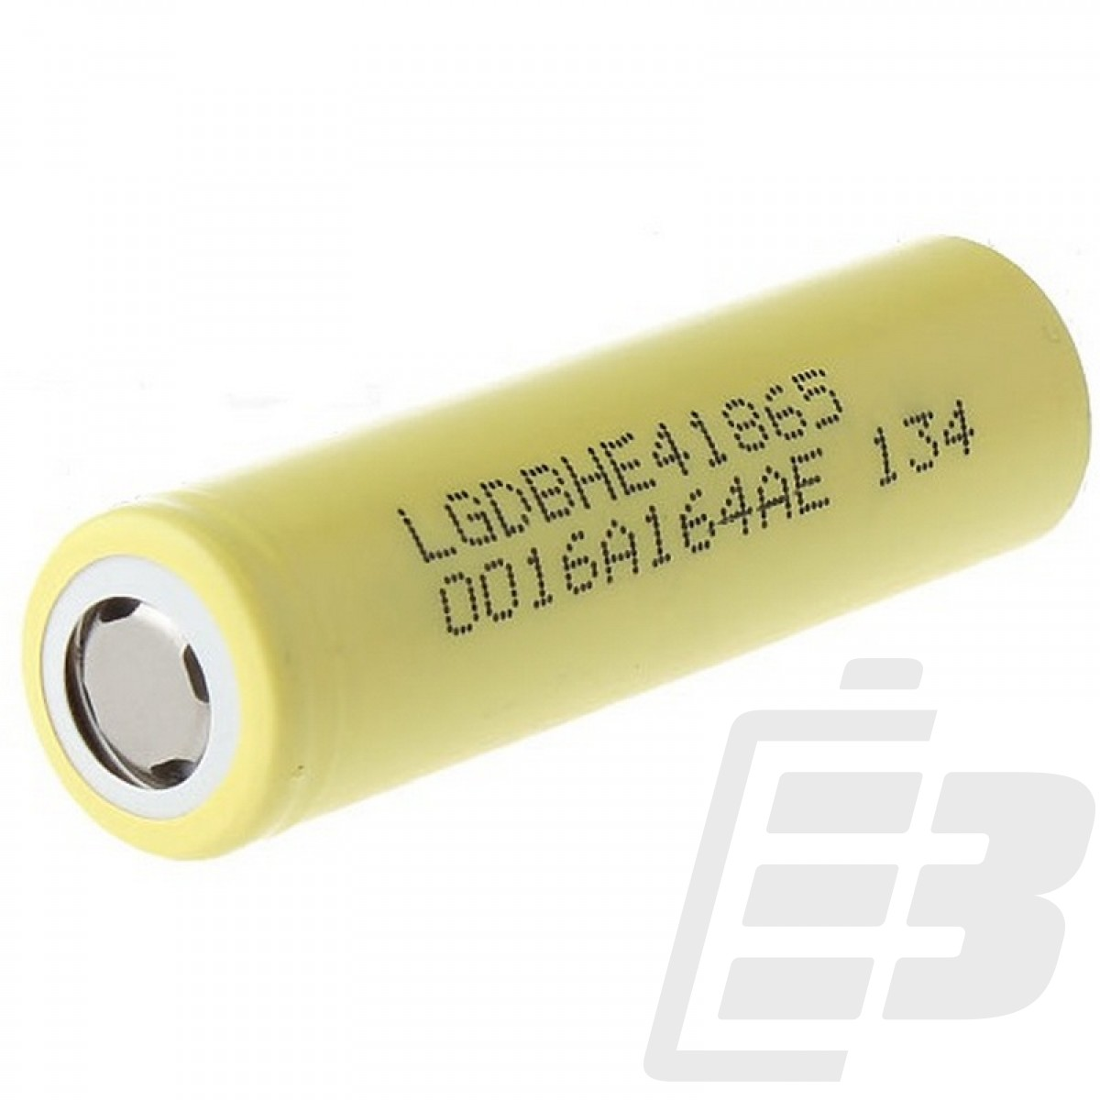 LG DBHE41865 battery 18650 2500mah 1